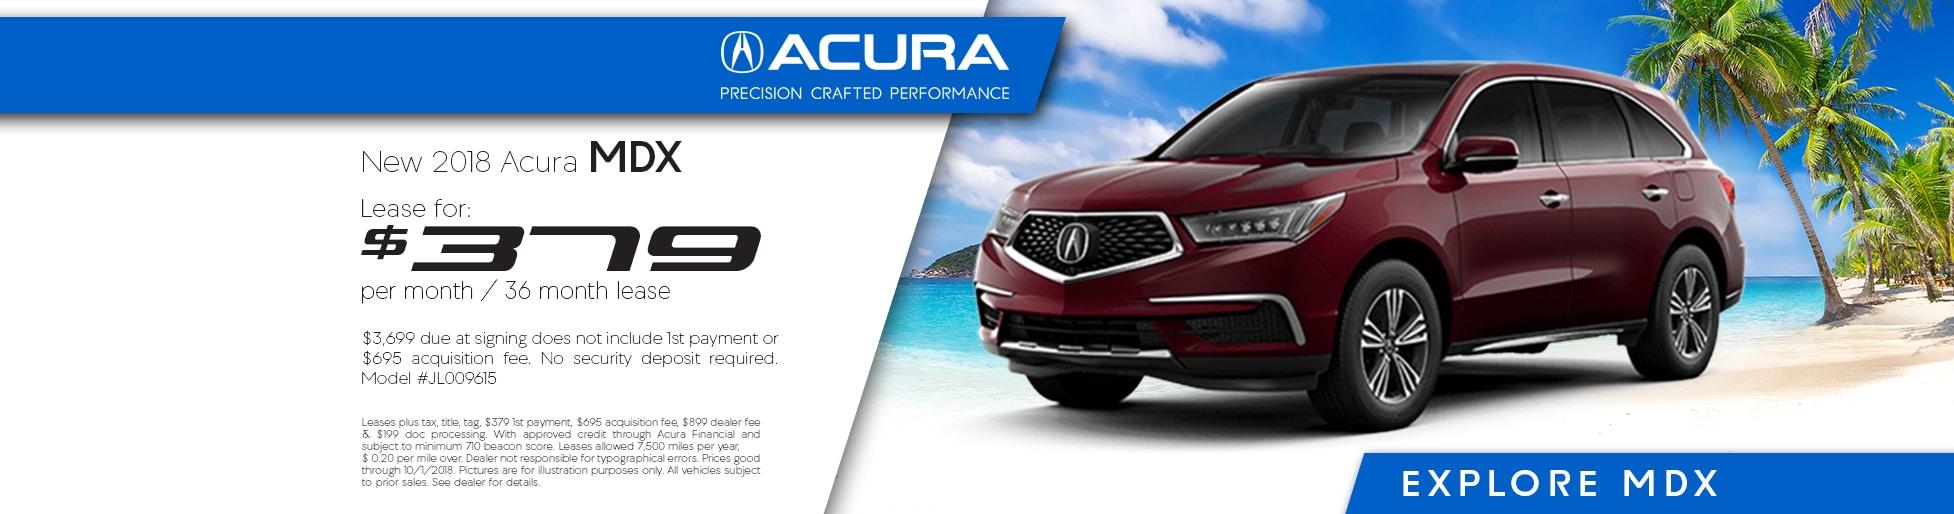 Acura MDX West Palm Beach MDX Deals Acura Dealership - Acura mdx dealers